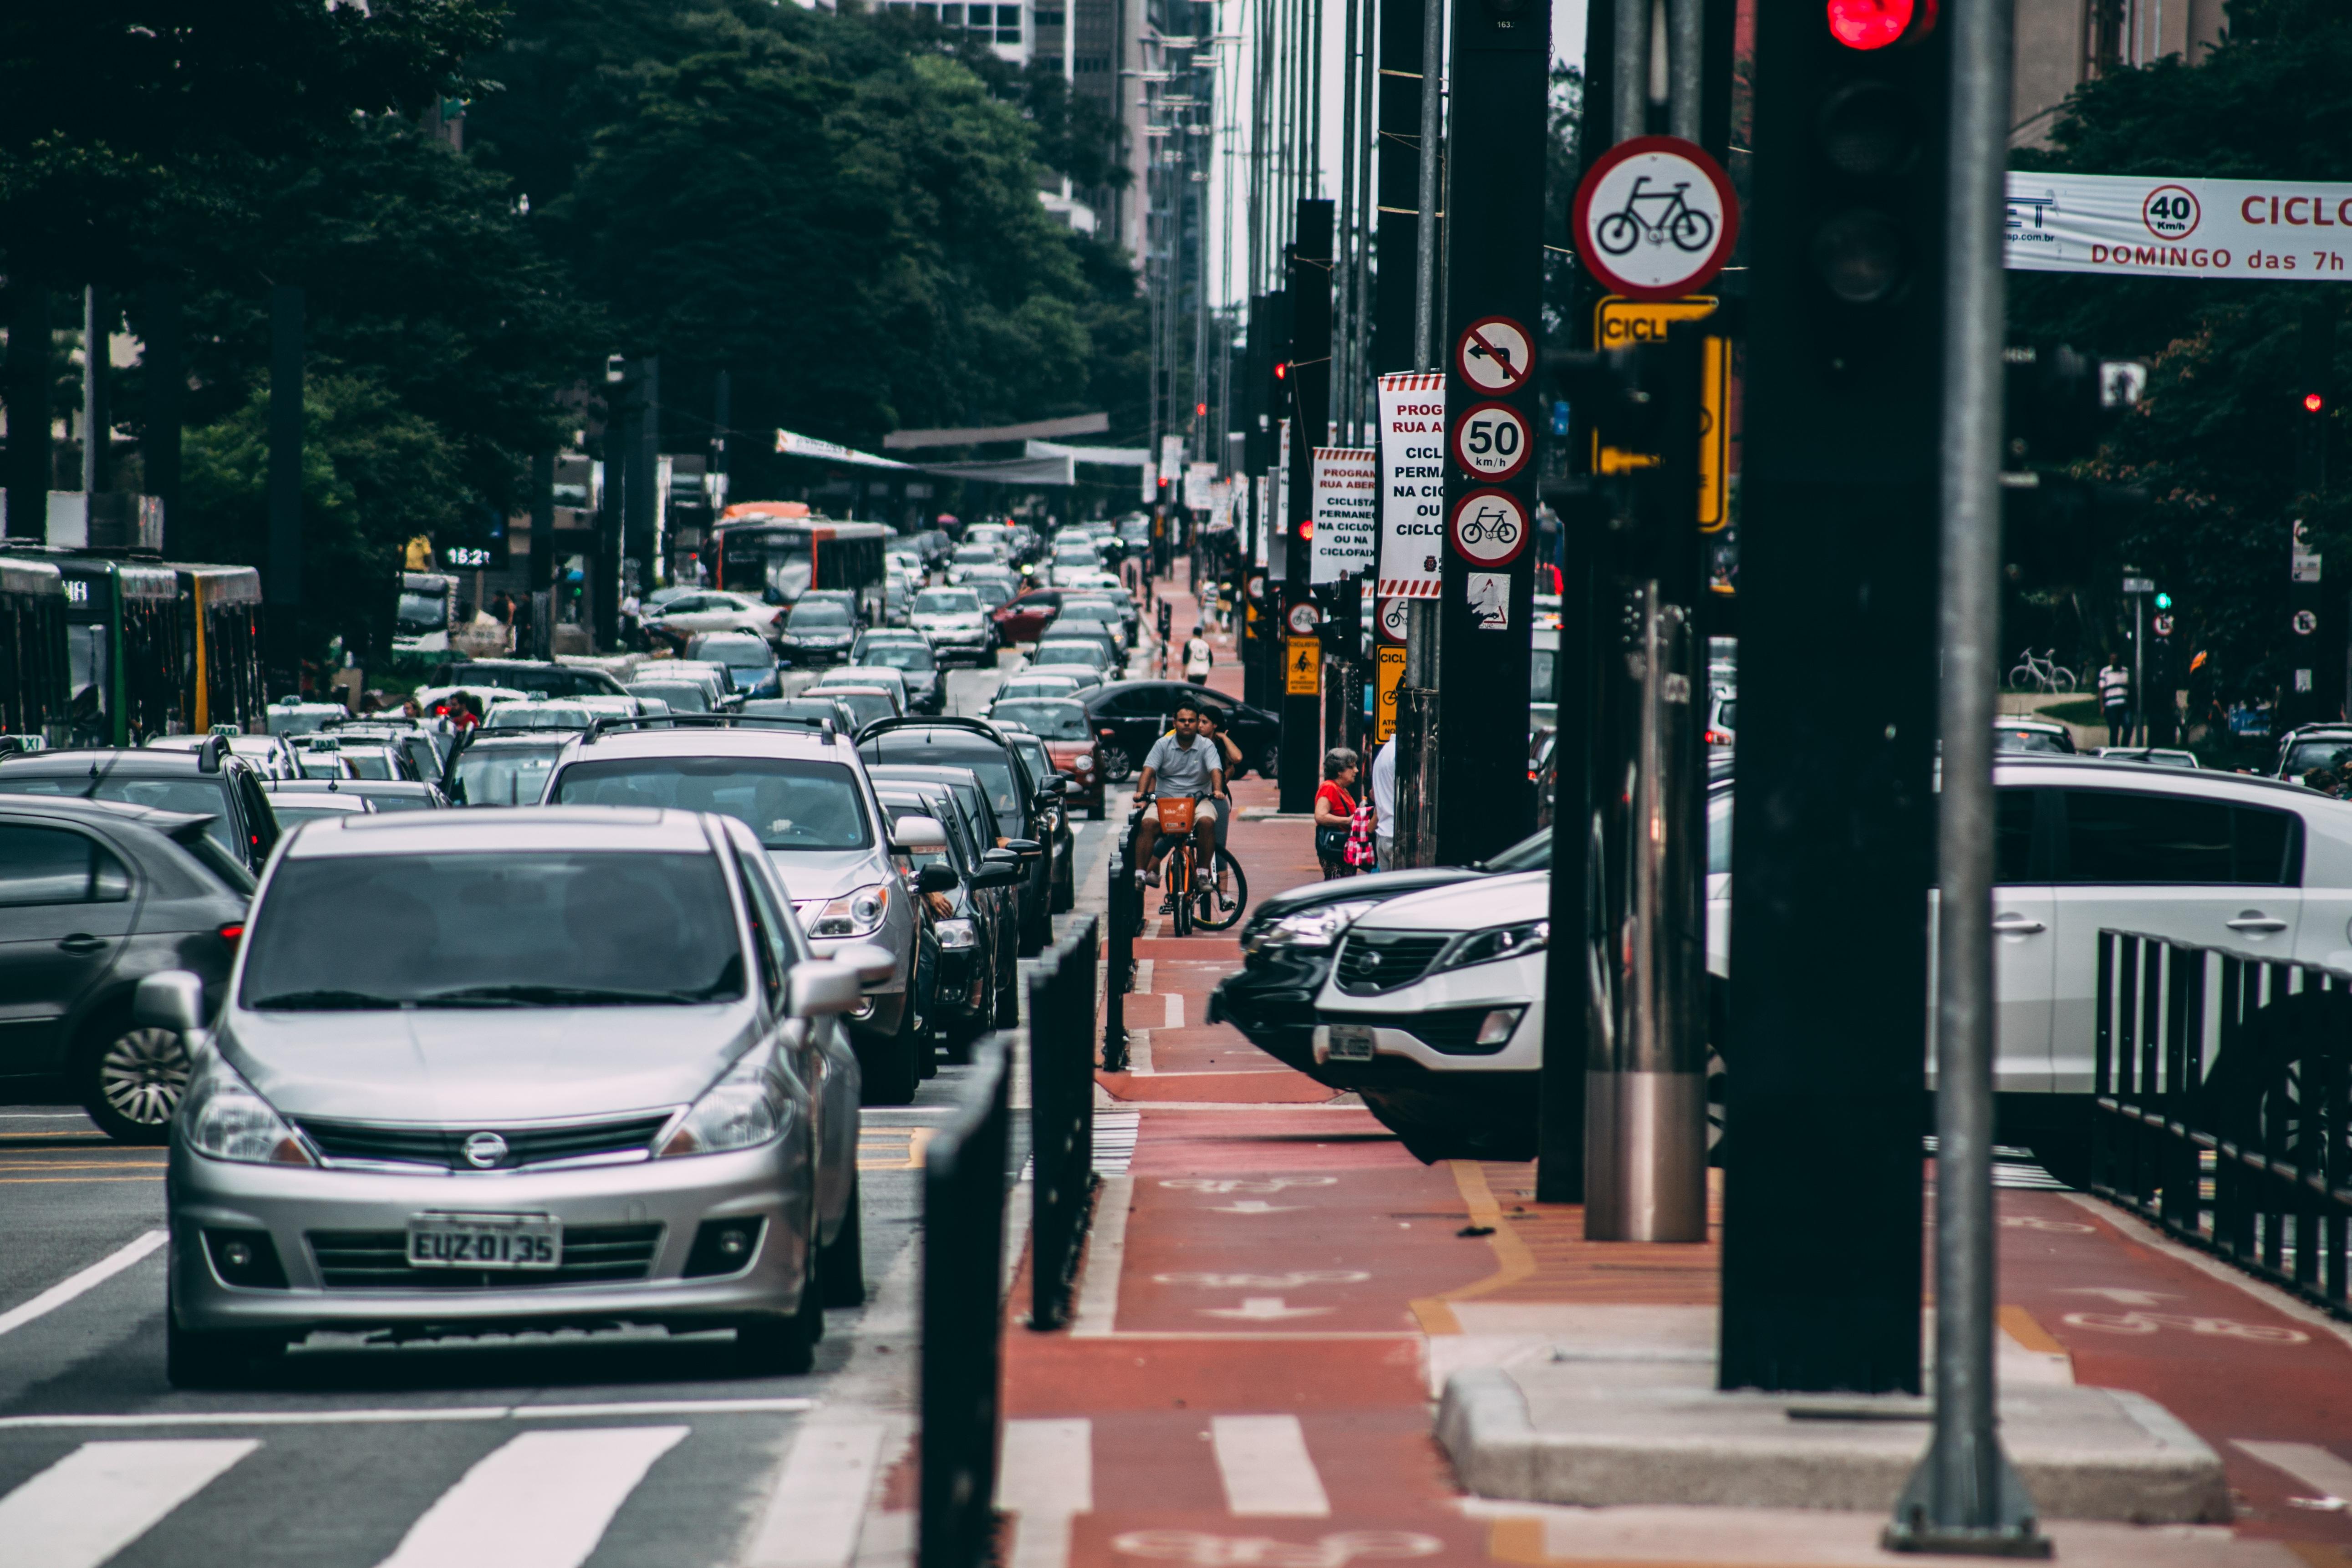 Flórida Paulista - São Paulo